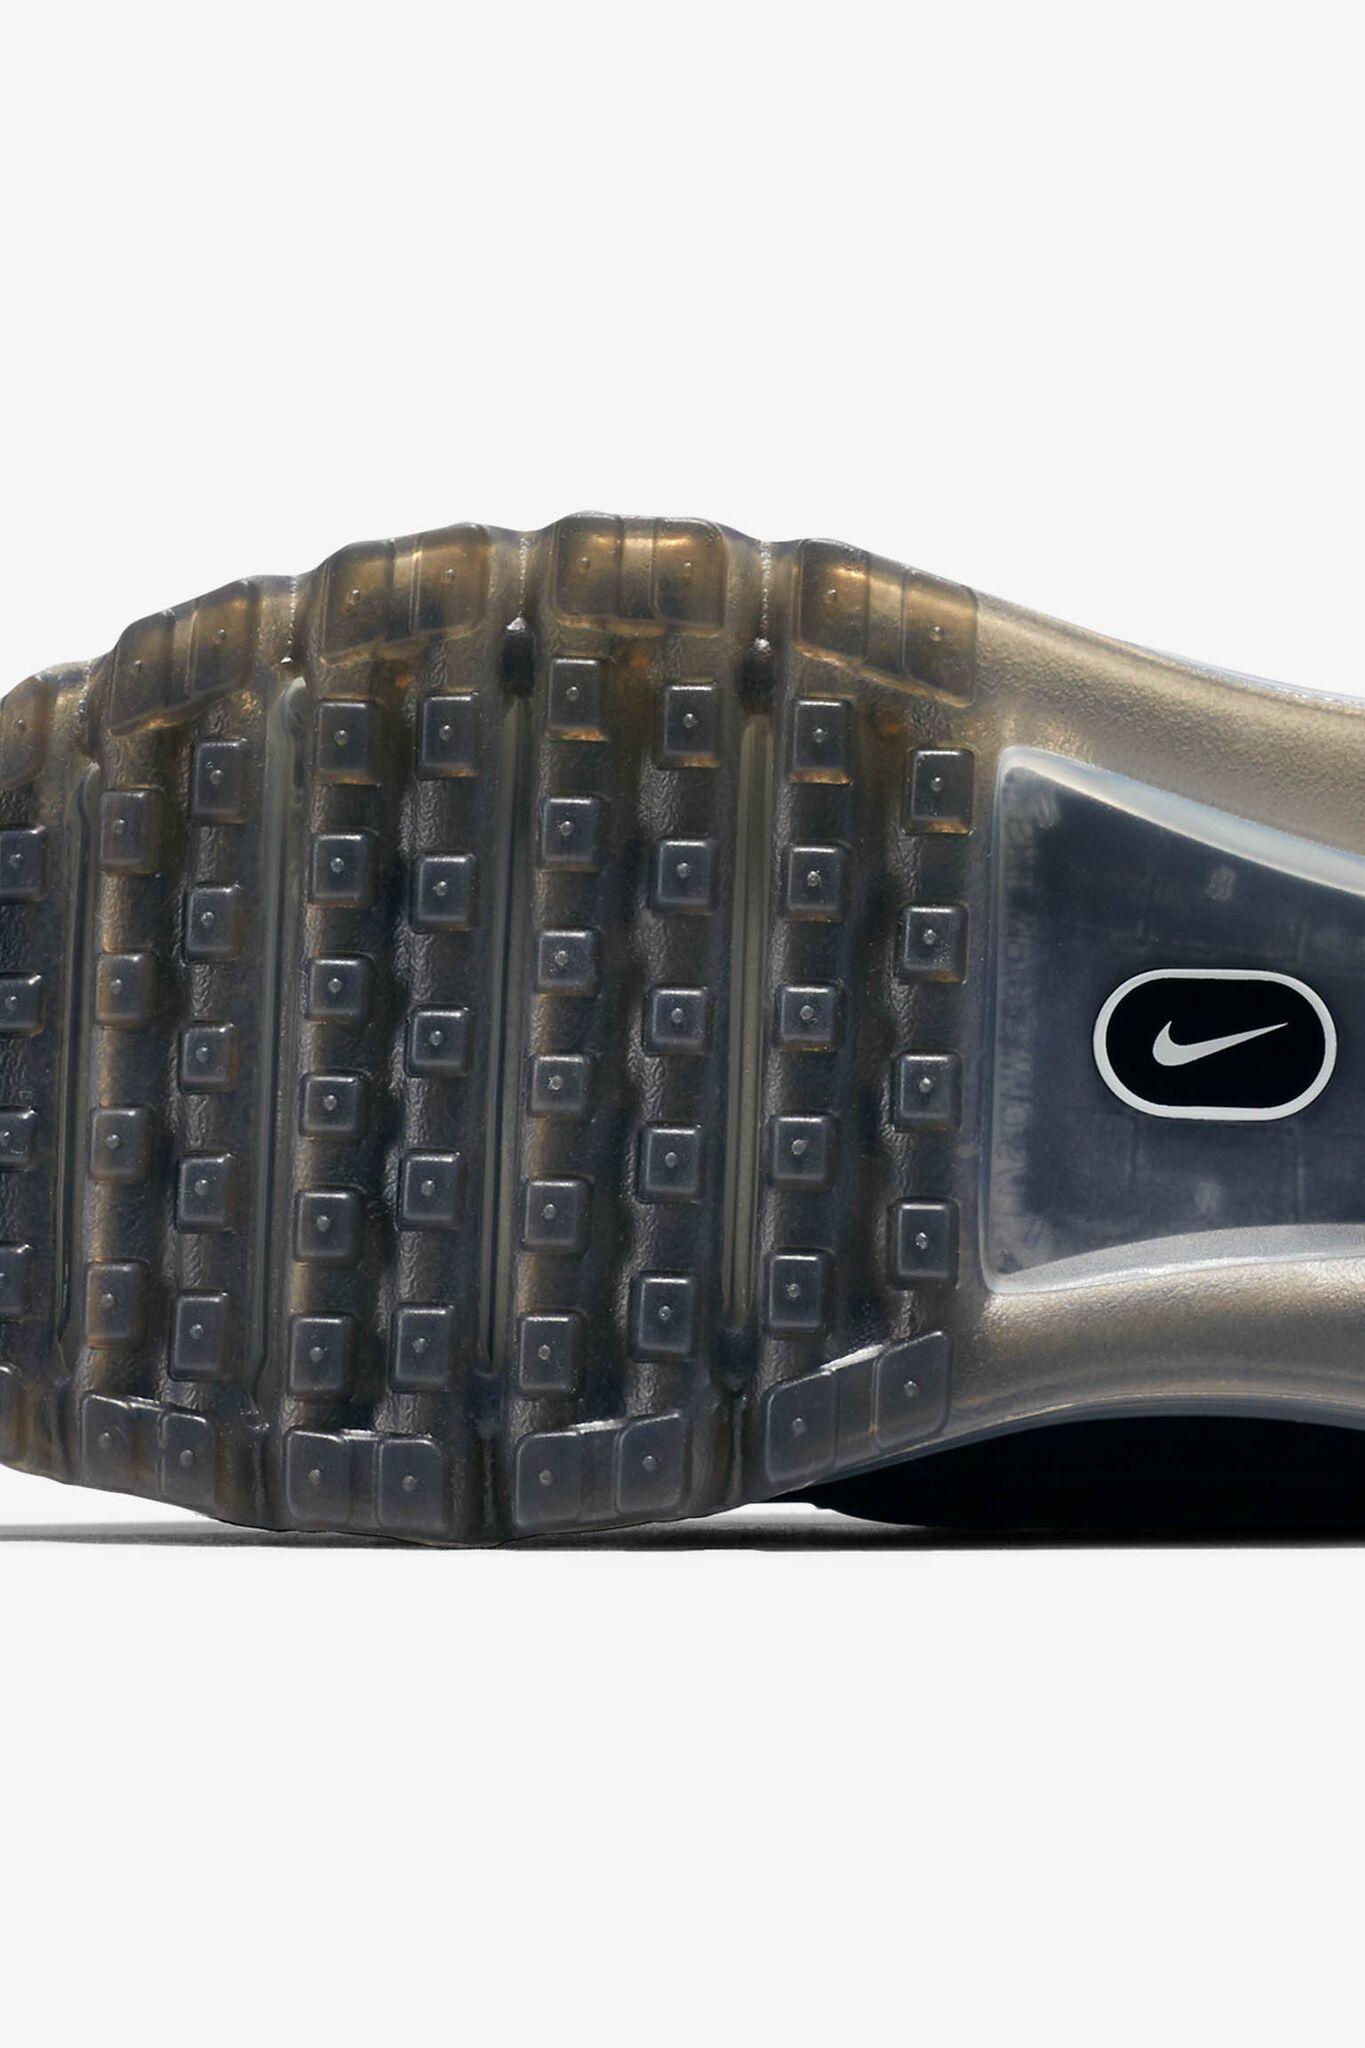 Nike Air Max LD-Zero H 'Black'. Release Date